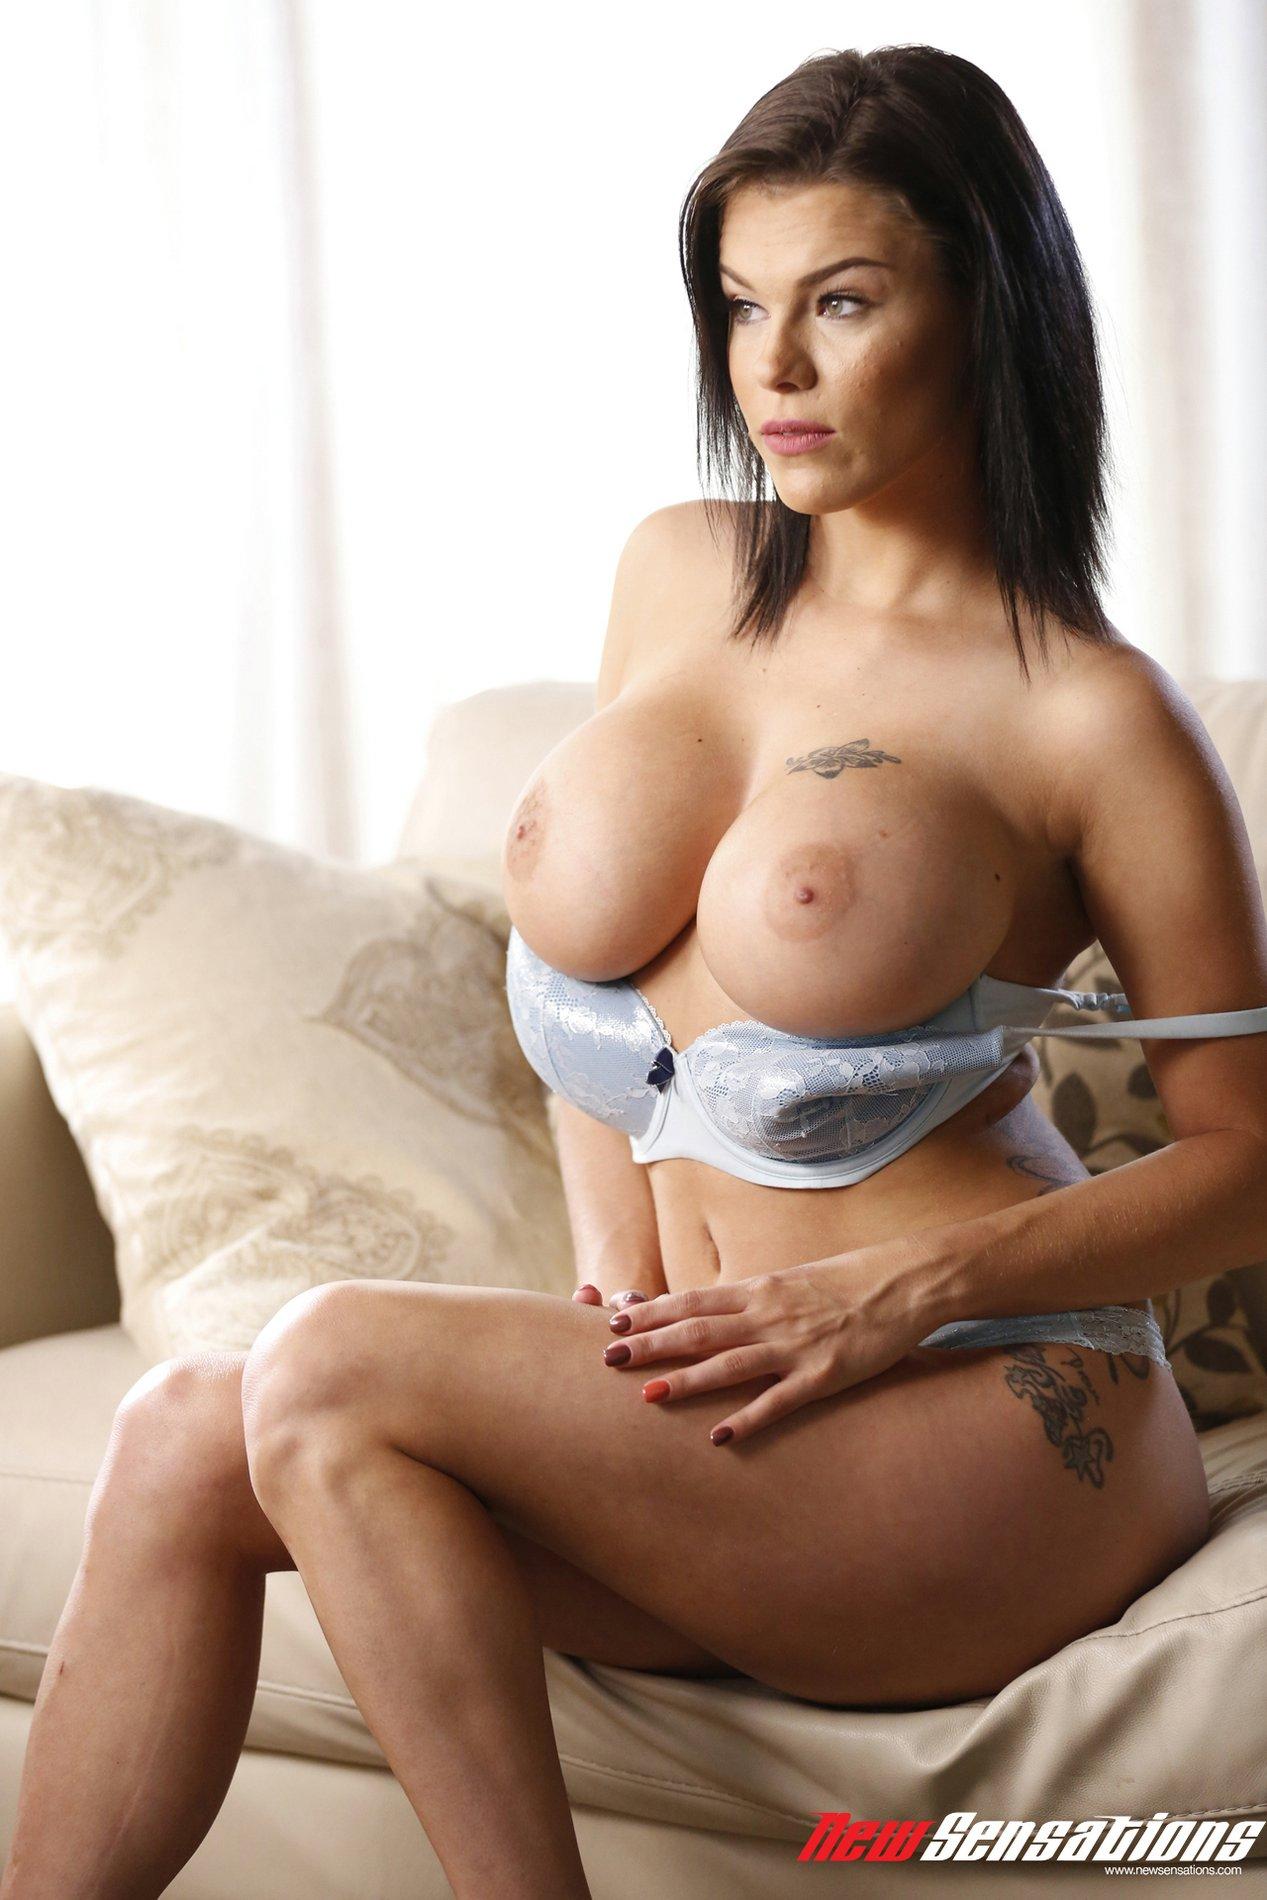 image Peta jensen perfect body compilation